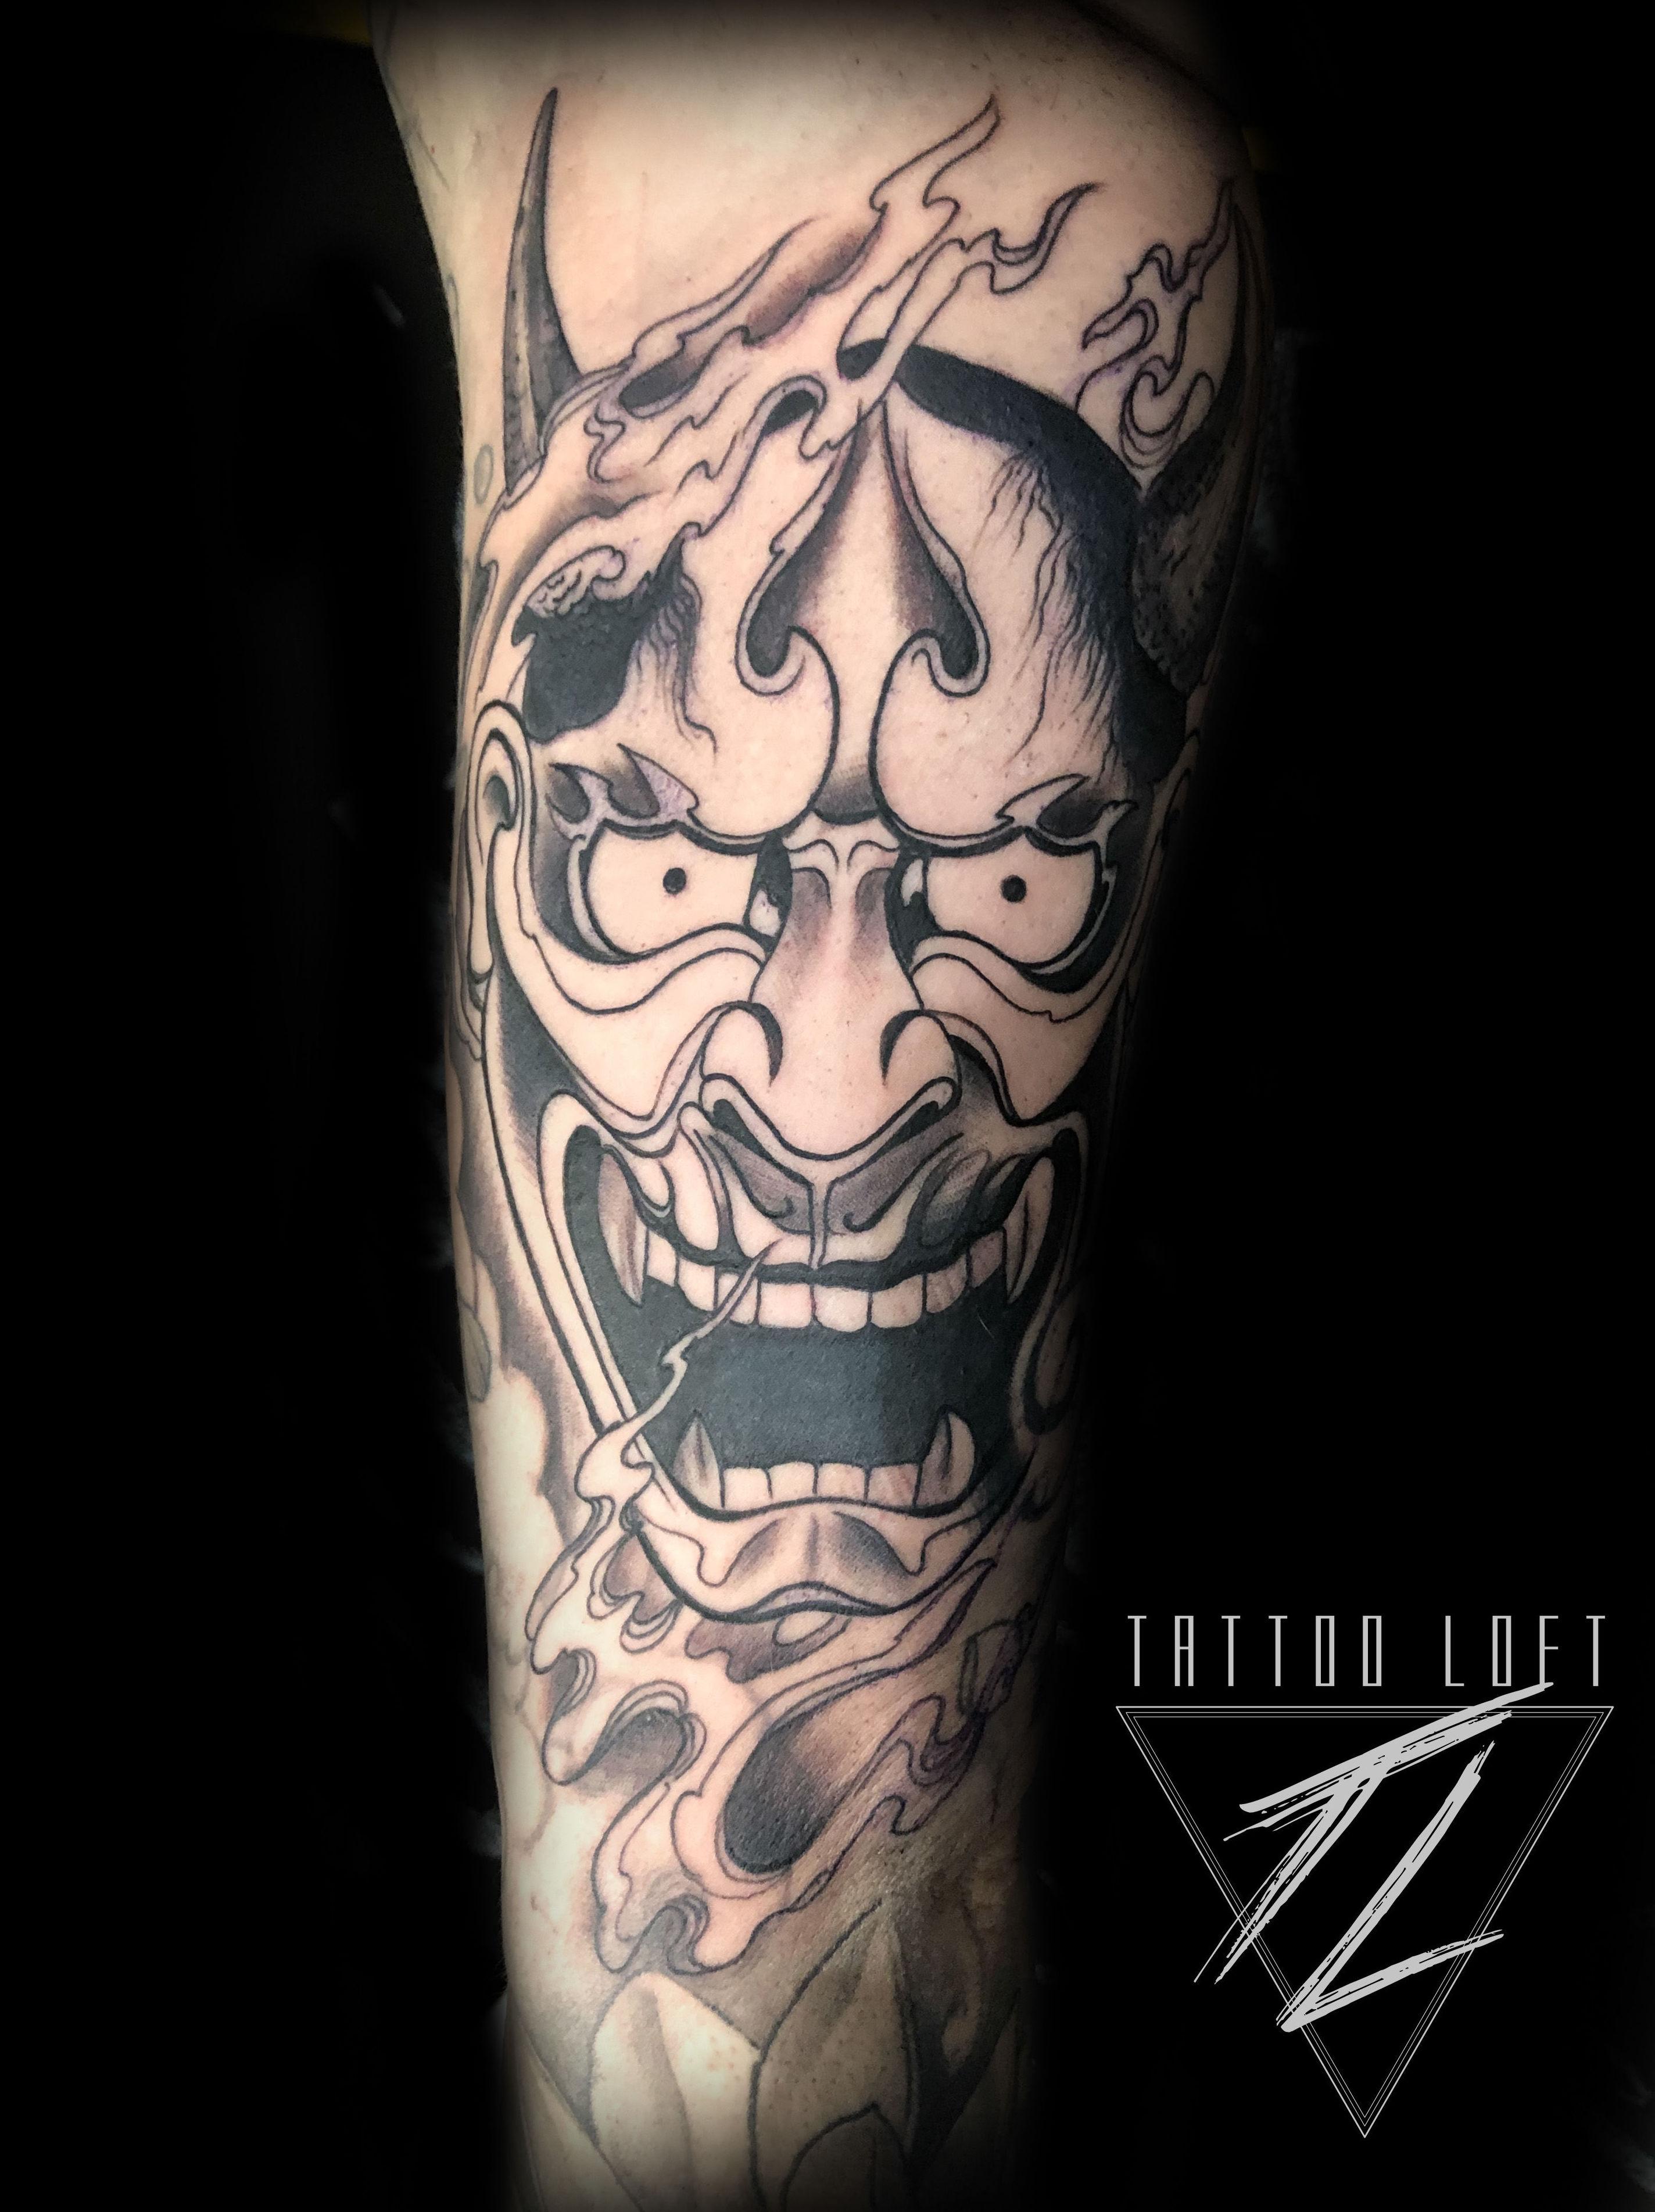 Foto 100 de Estudio artístico de tatuaje en  | Tattoo Loft